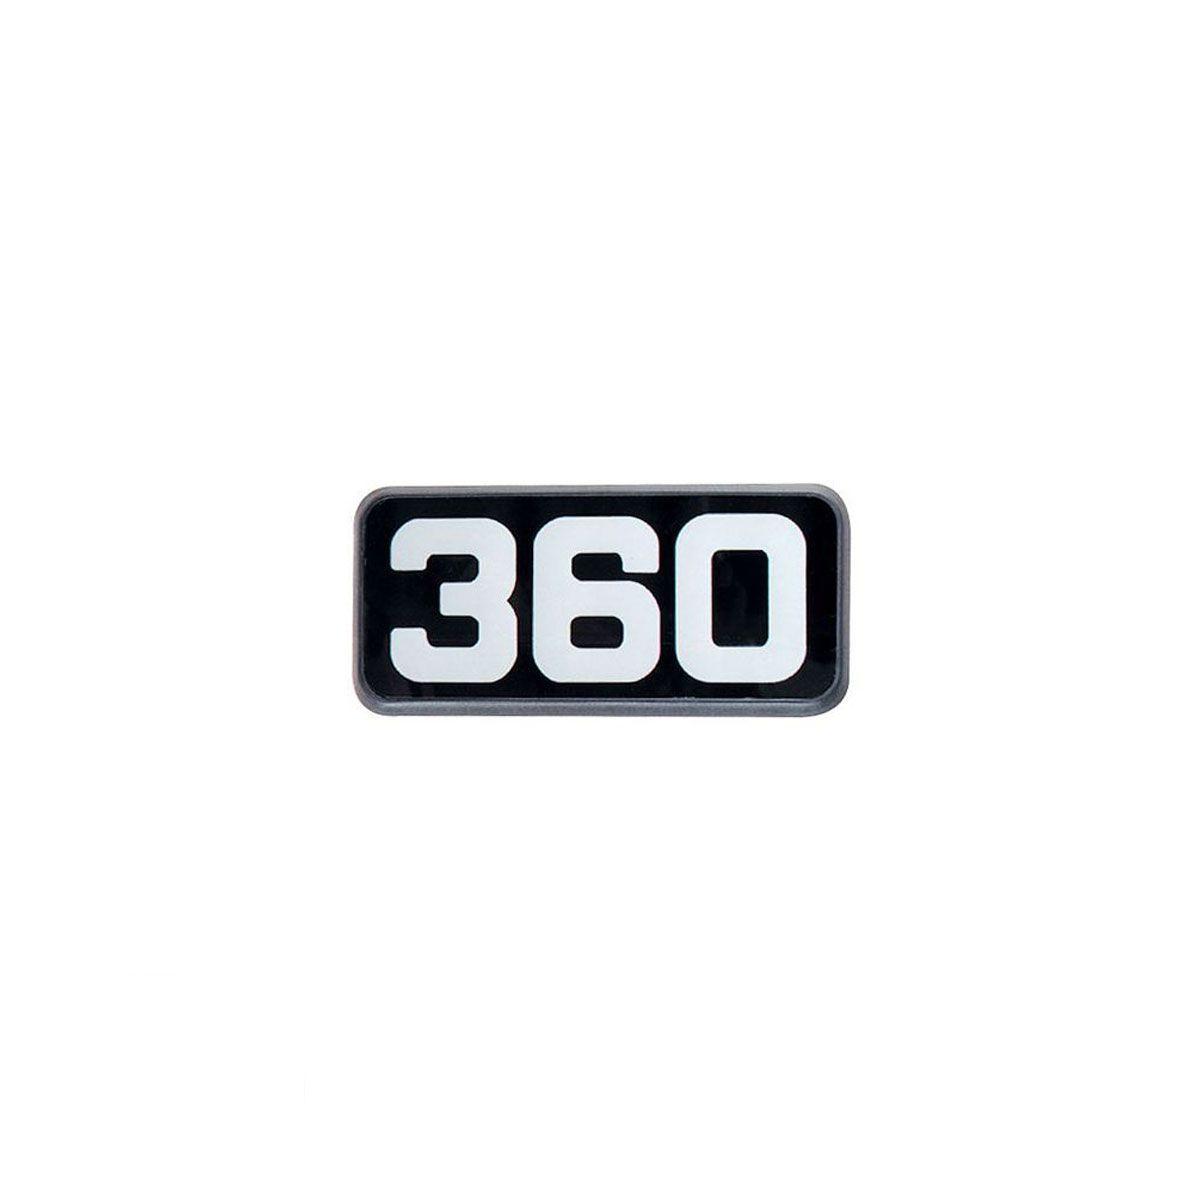 Emblema Lateral 360 Volvo 20360289